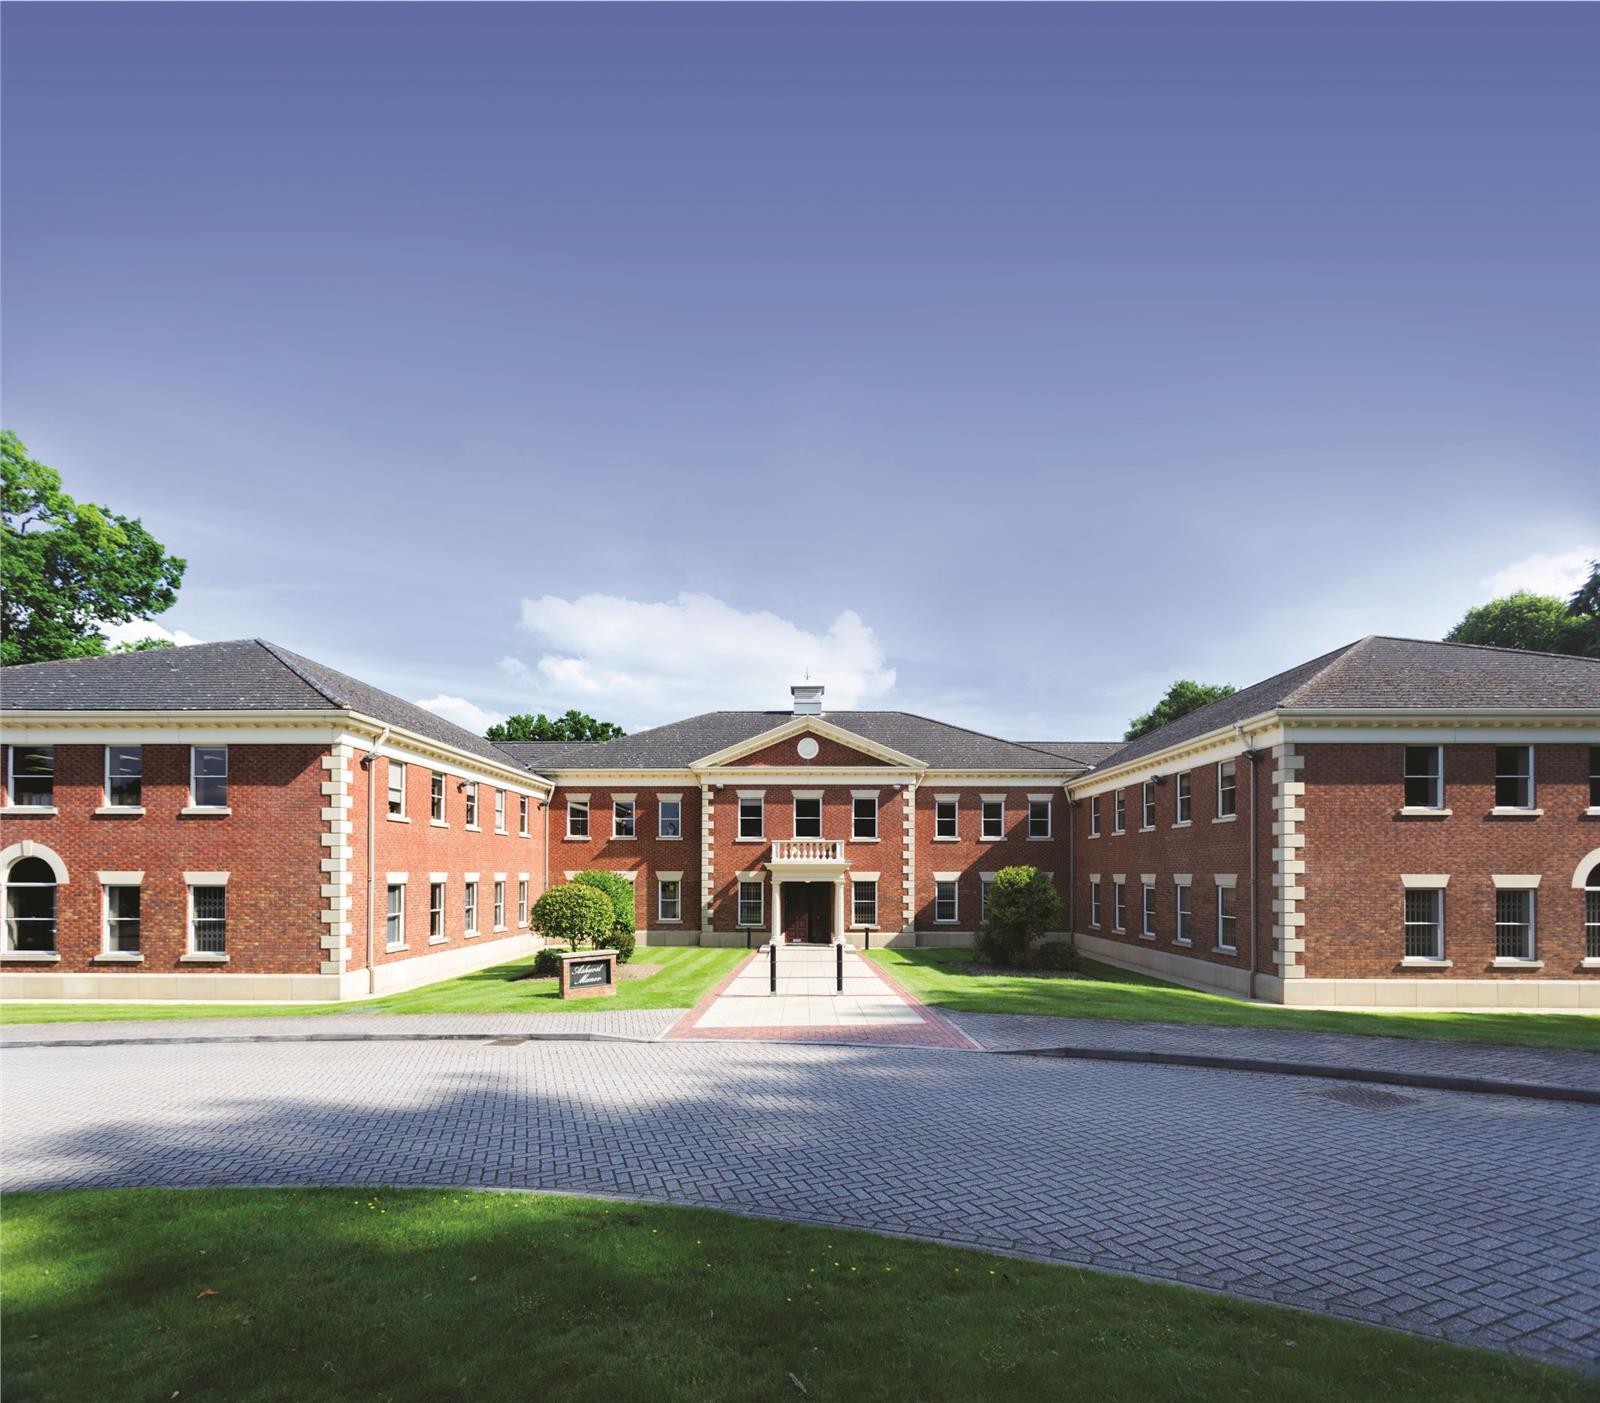 Ashurst Manor, Ashurst Park, Church Lane, Ascot, Berkshire, SL5 7DD